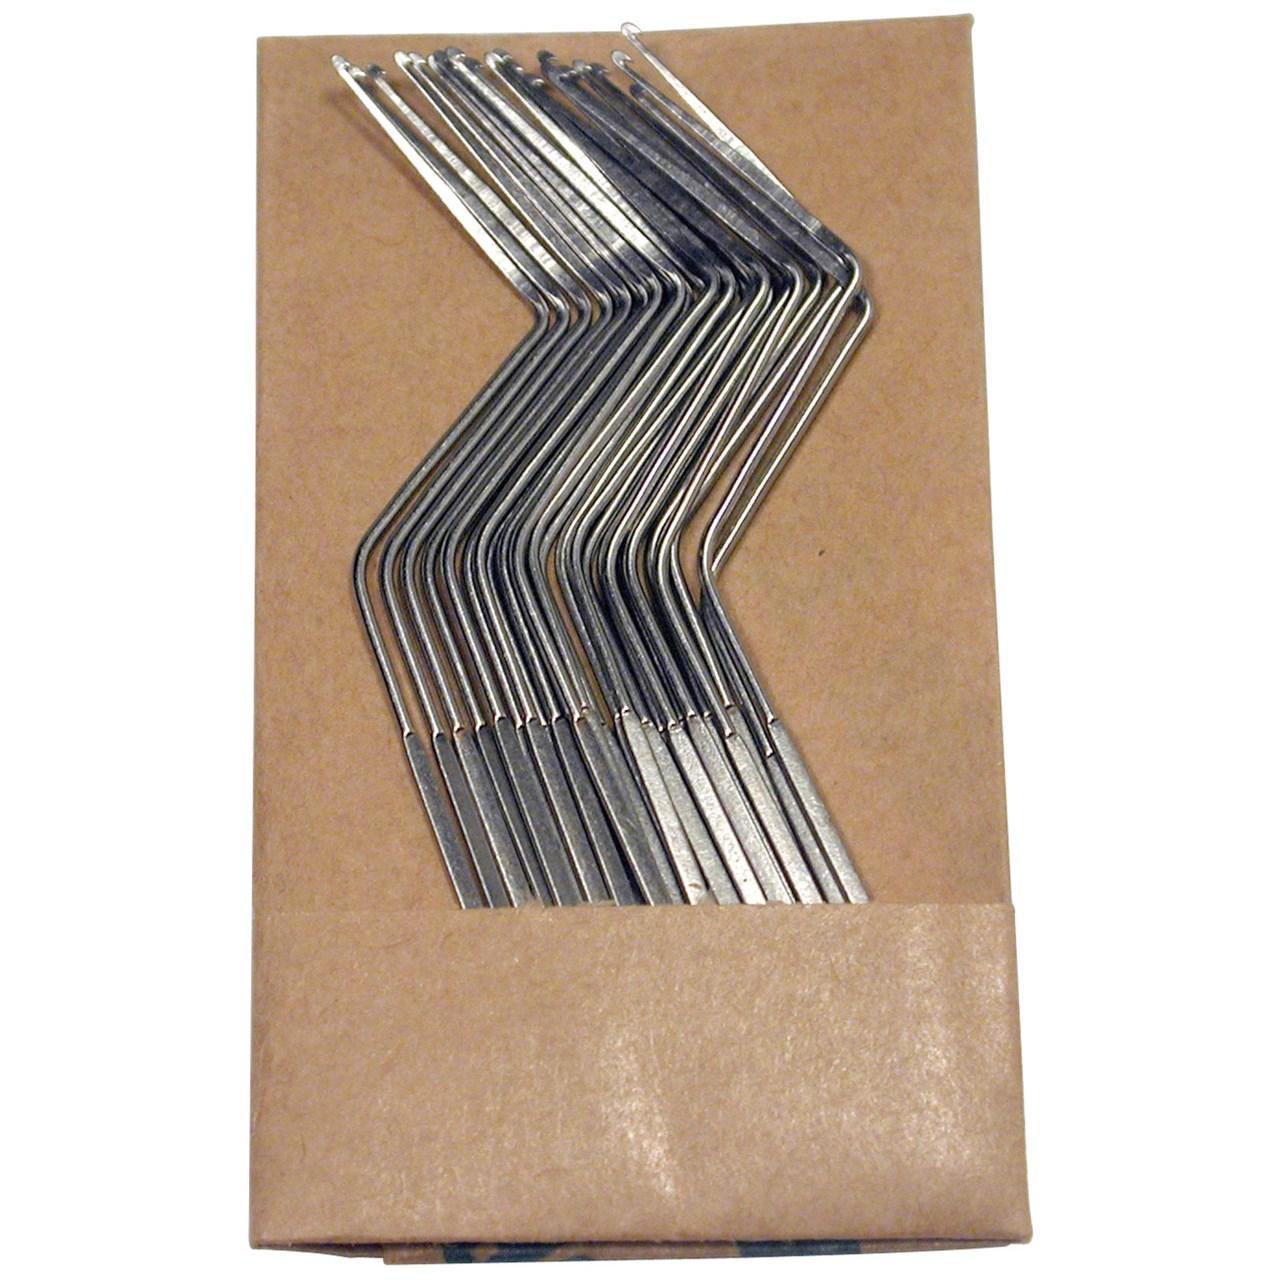 Precision Needle Threader - 25 extra hooks